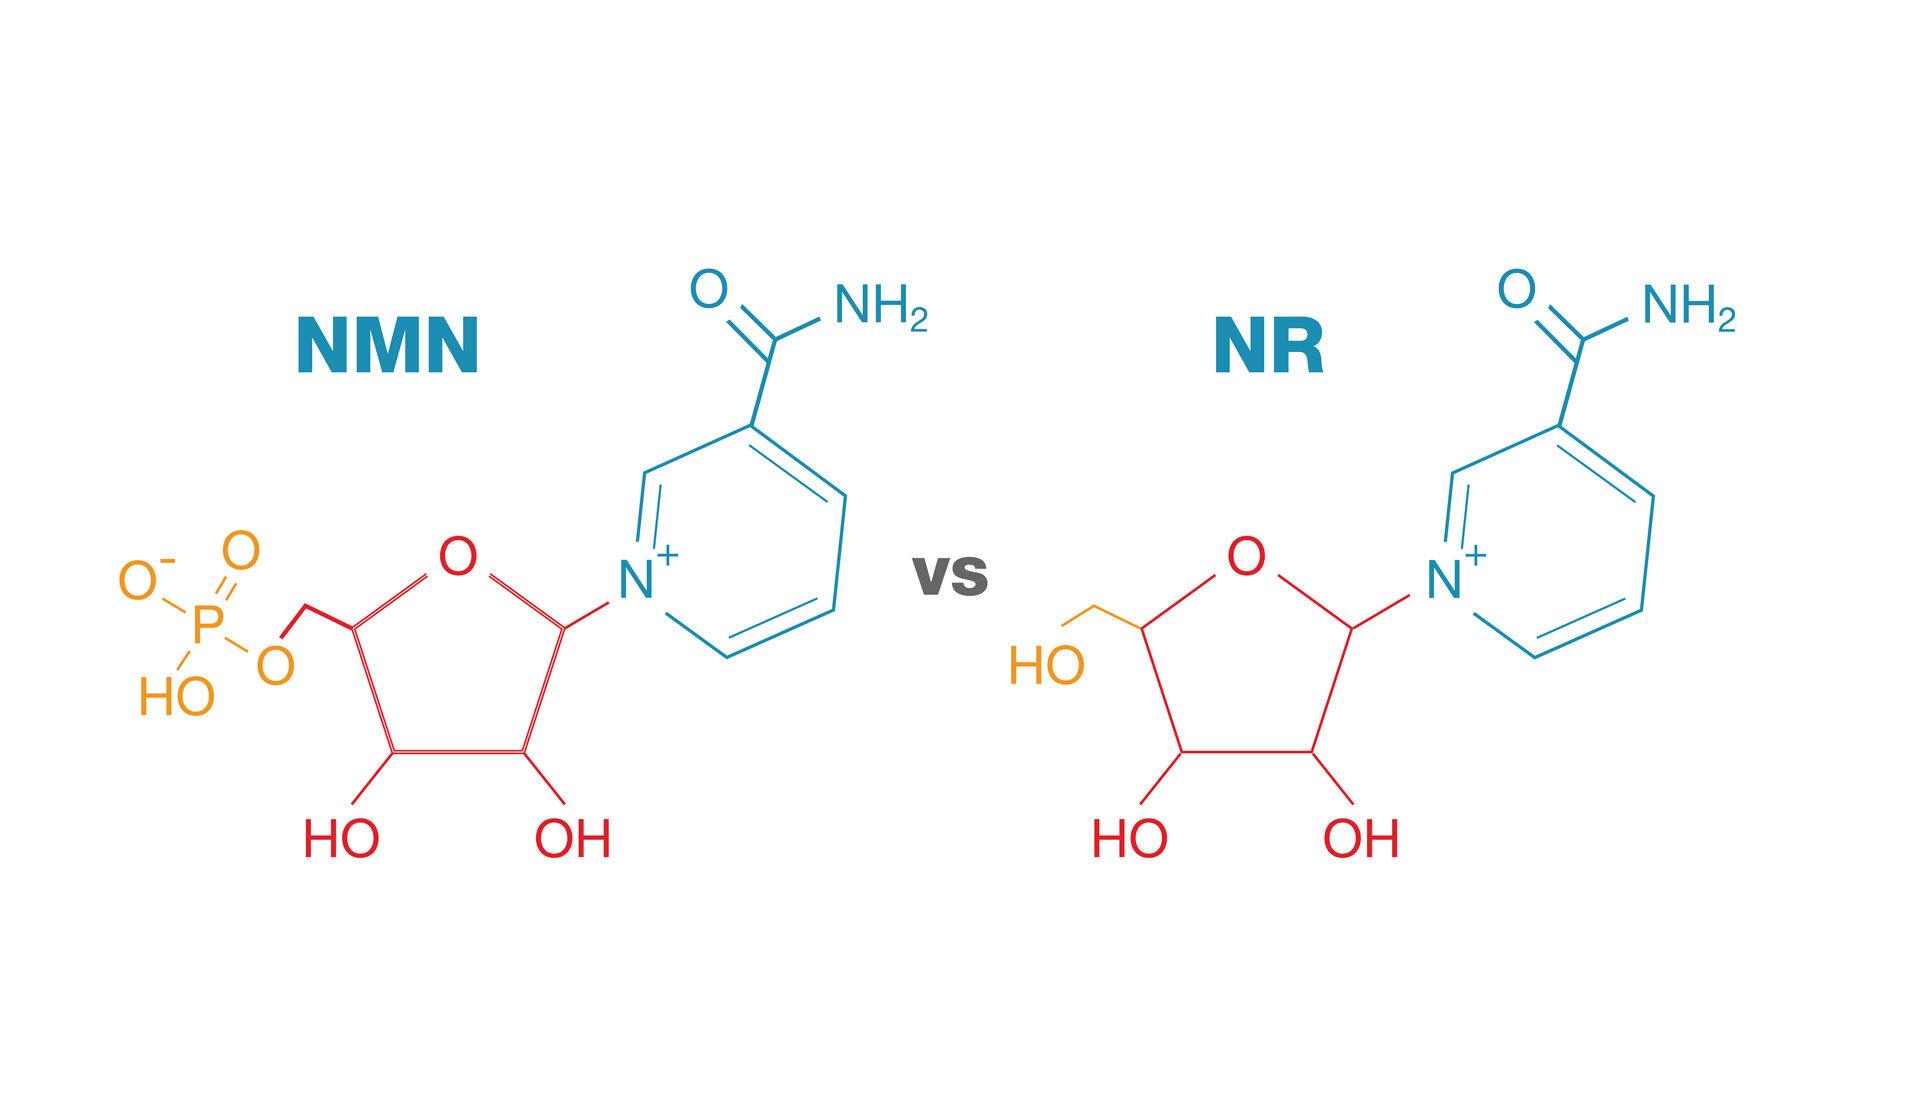 NMN_vs_NR